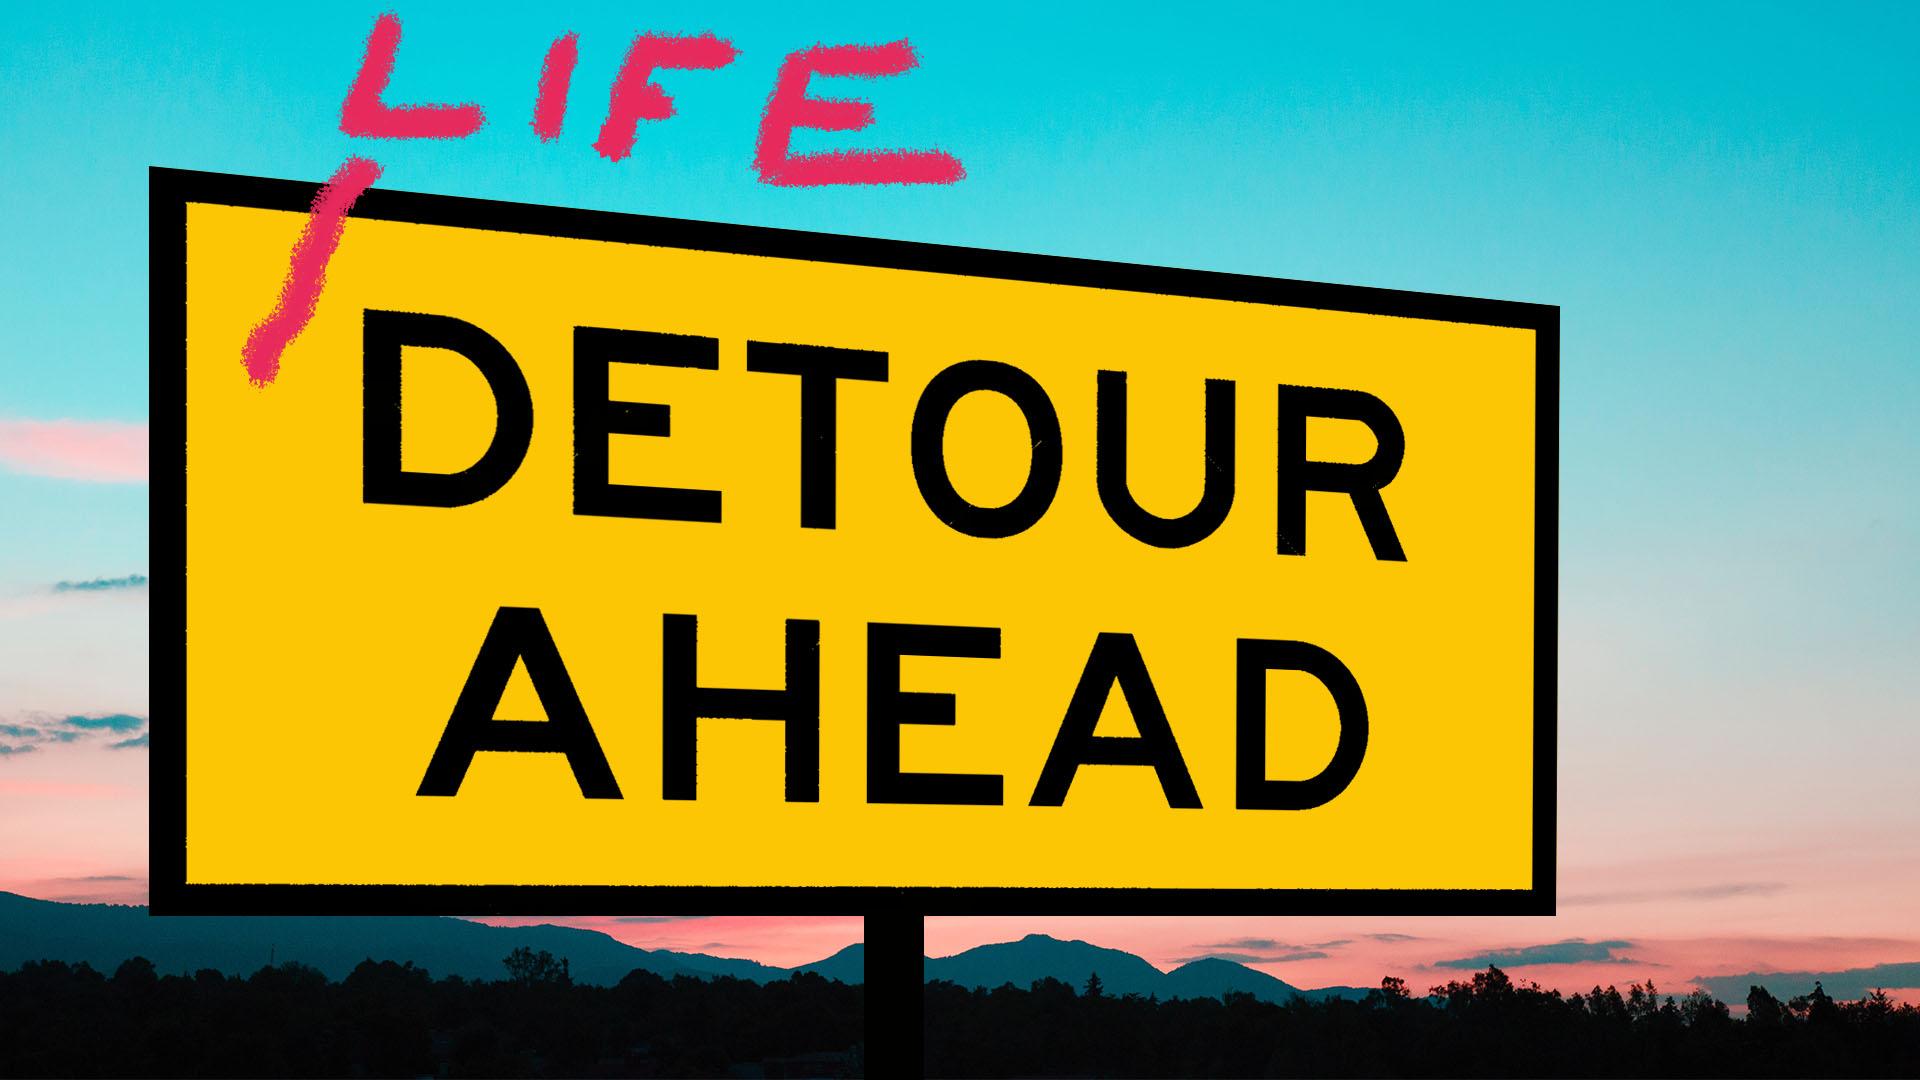 A 'detour ahead' road sign against a sunset horizon.